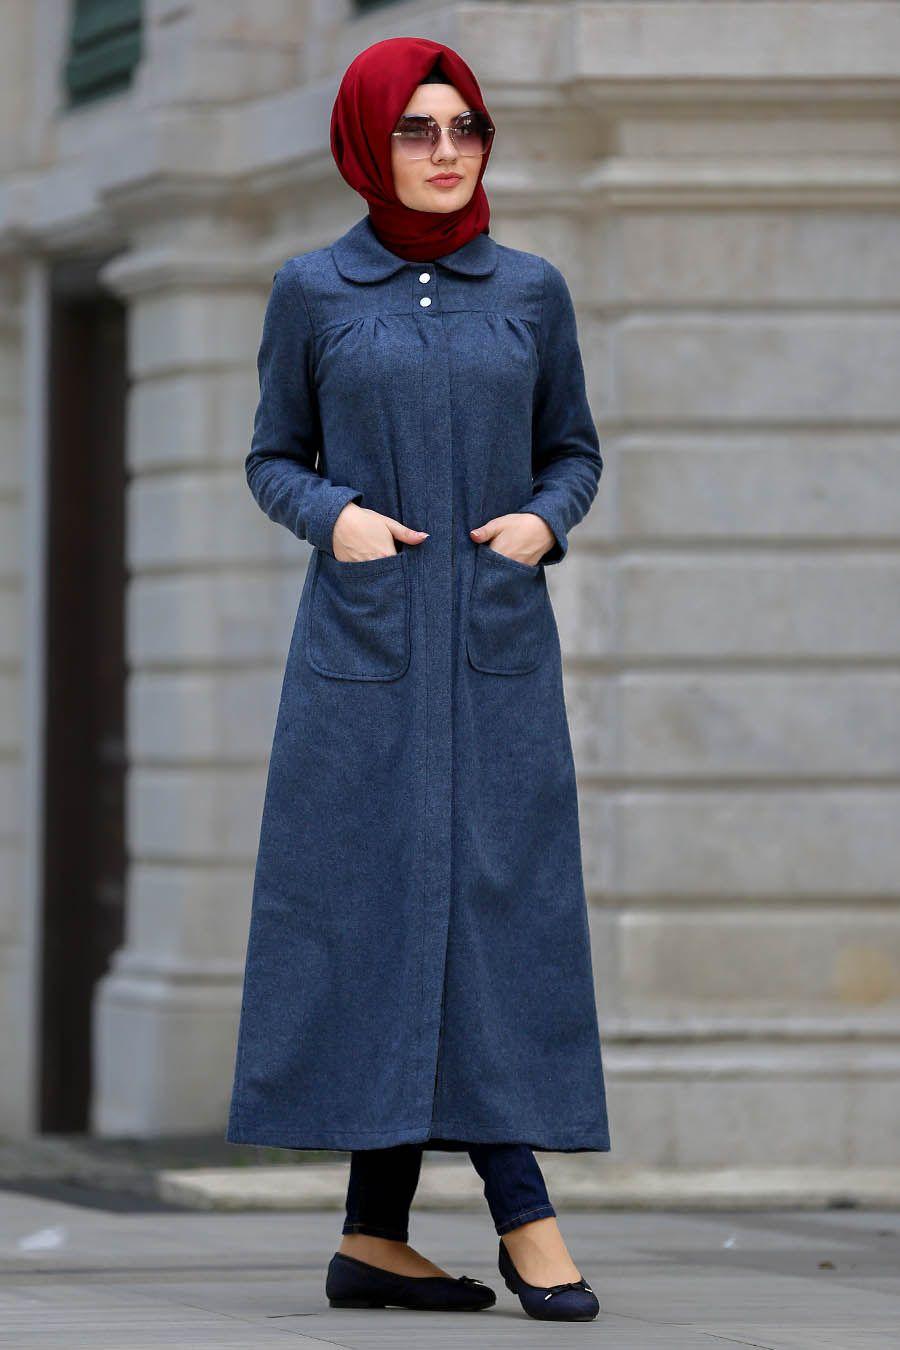 Tesettür Giyim Kayra Kap 2019